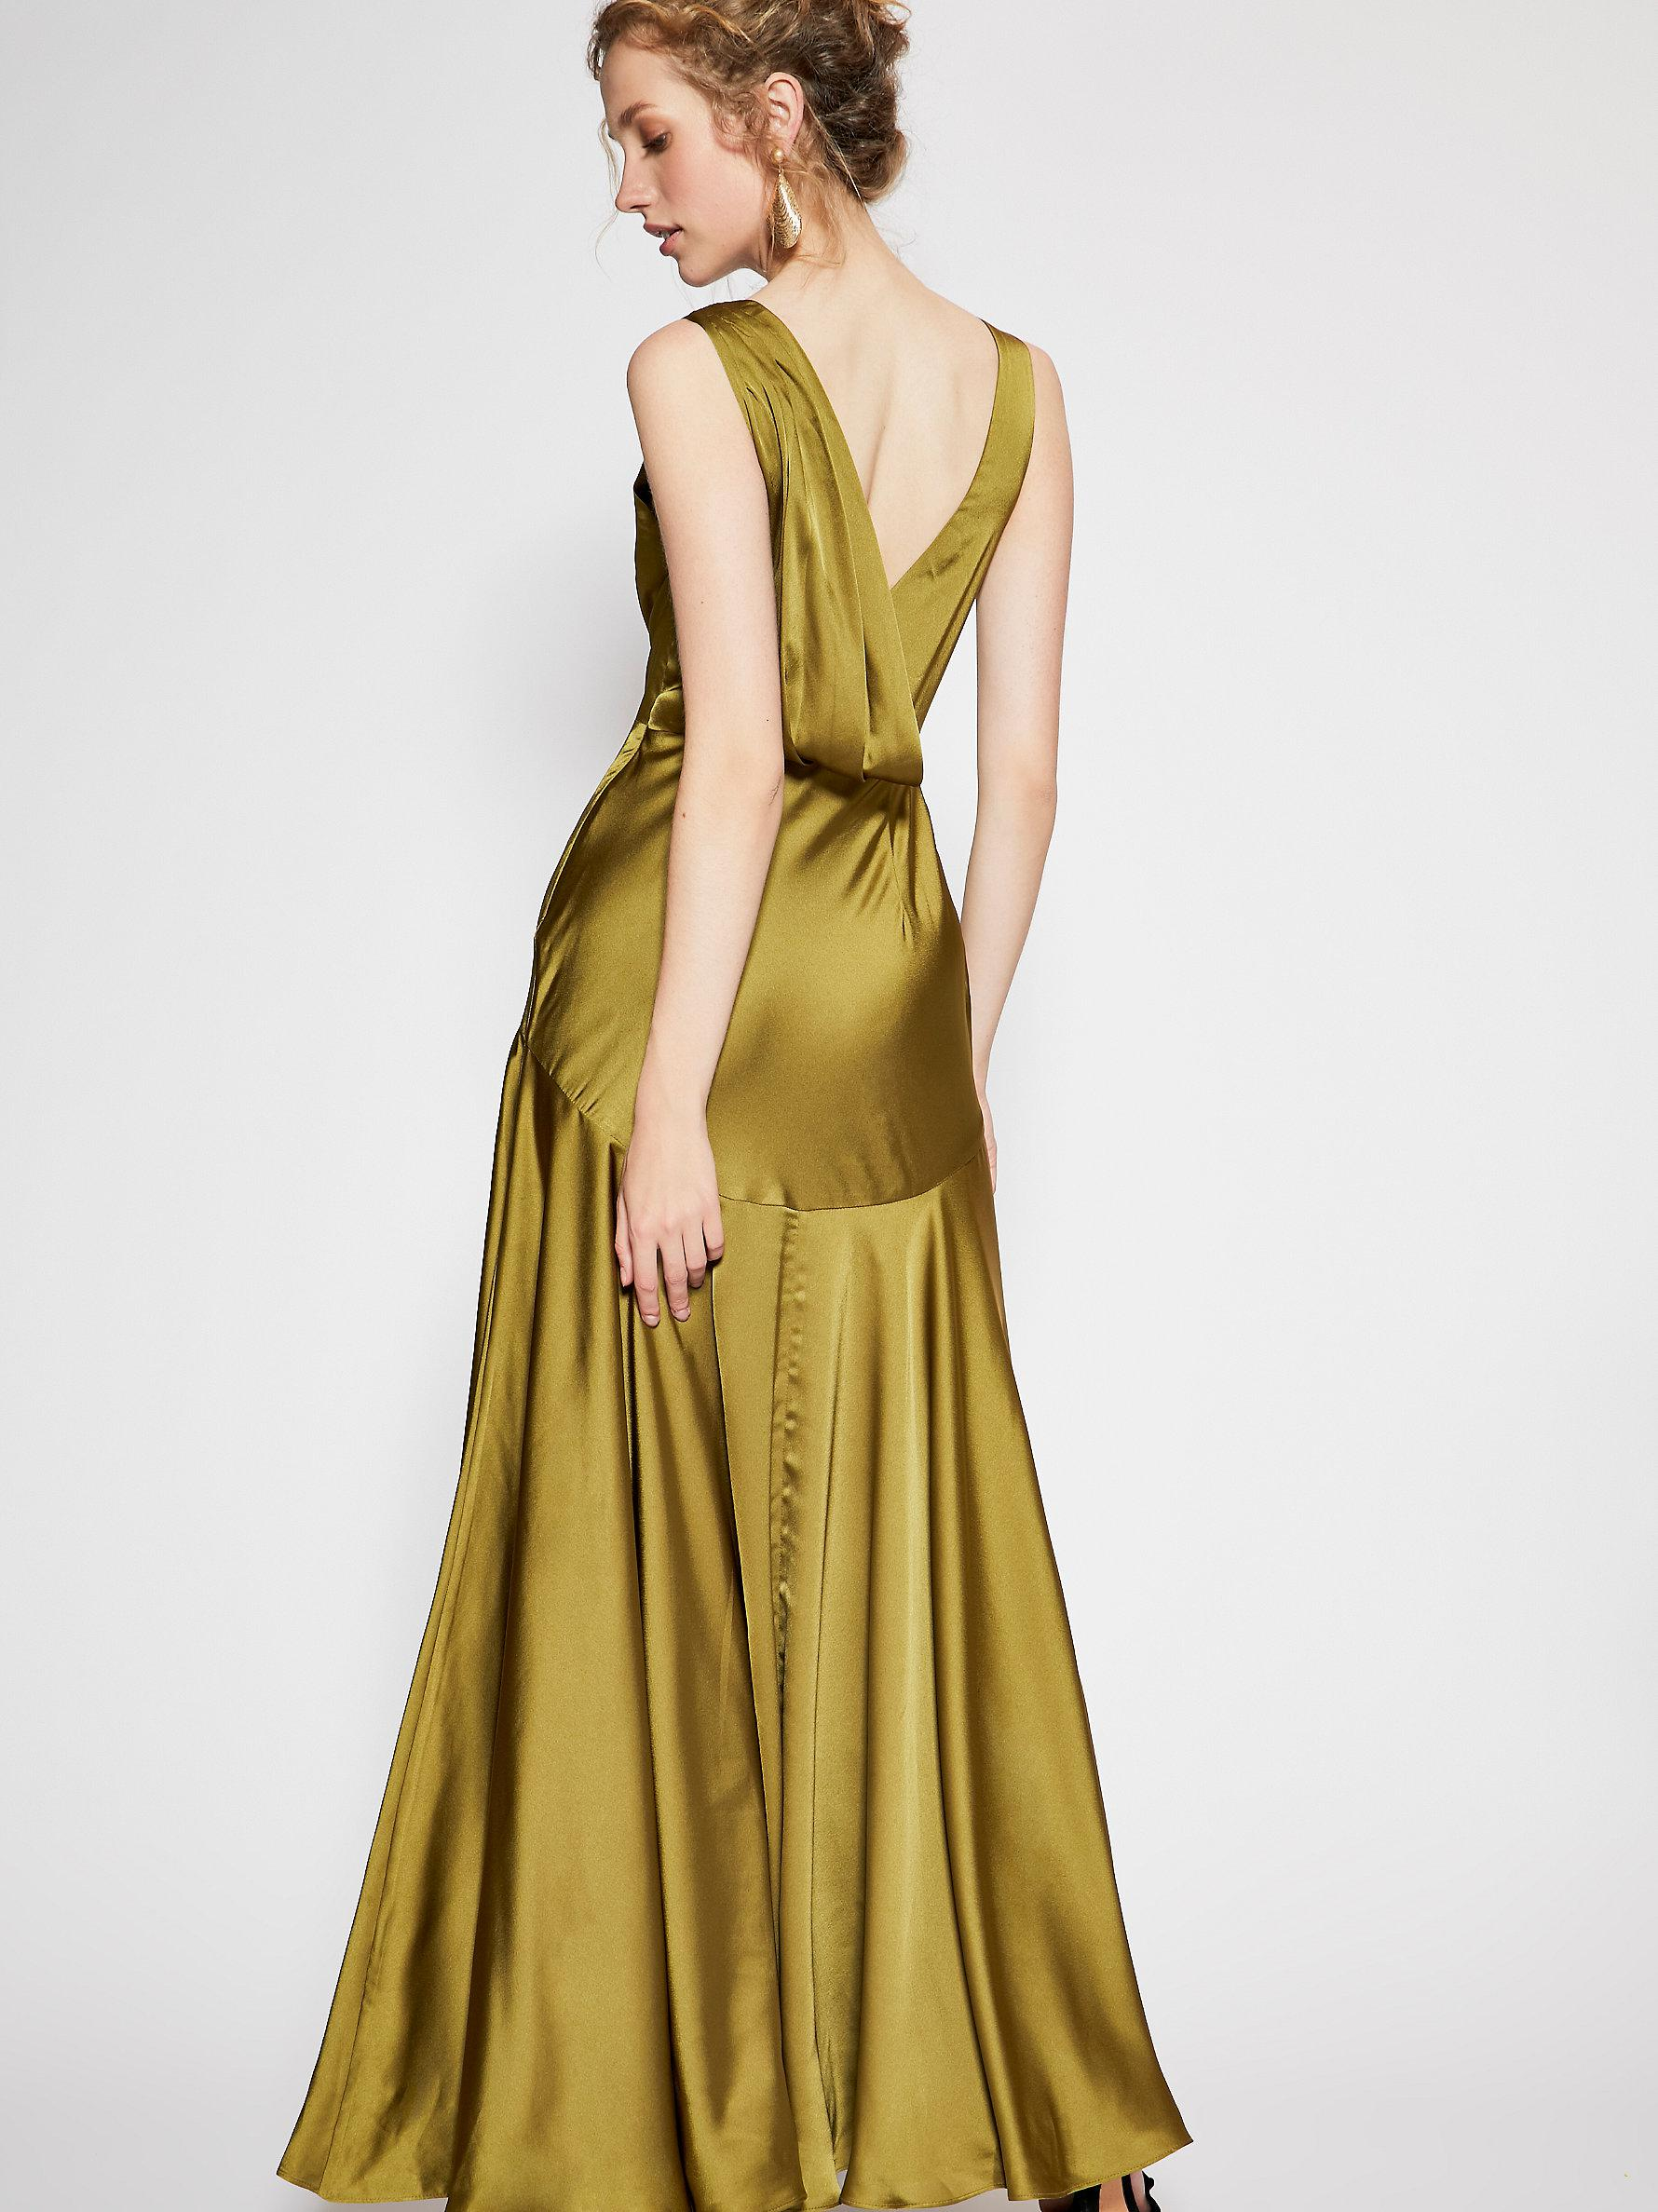 3a9c062c88 Free People Essie Maxi Dress in Green - Lyst